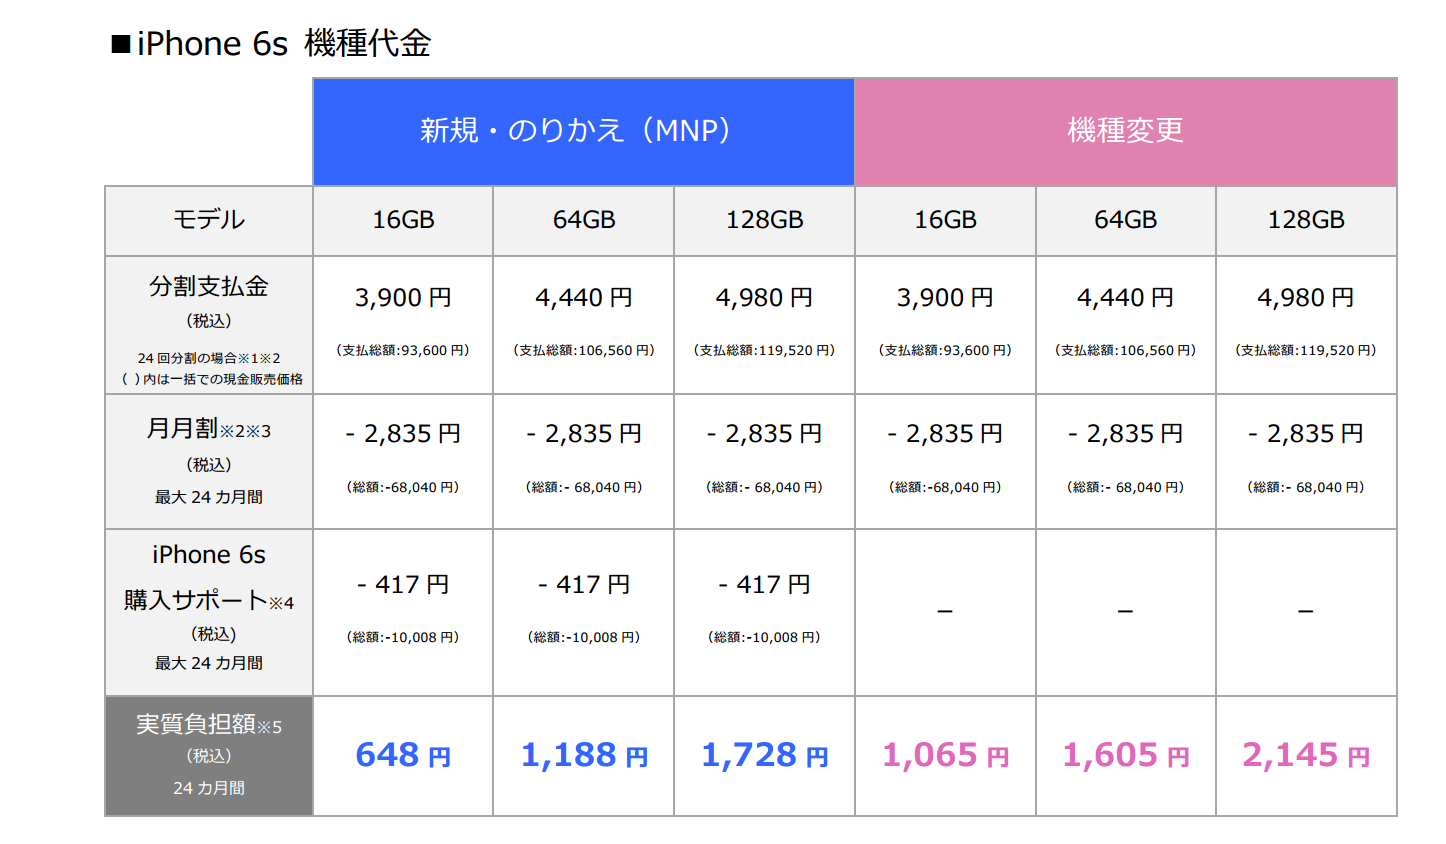 iPhone 6sの価格(ソフトバンク)